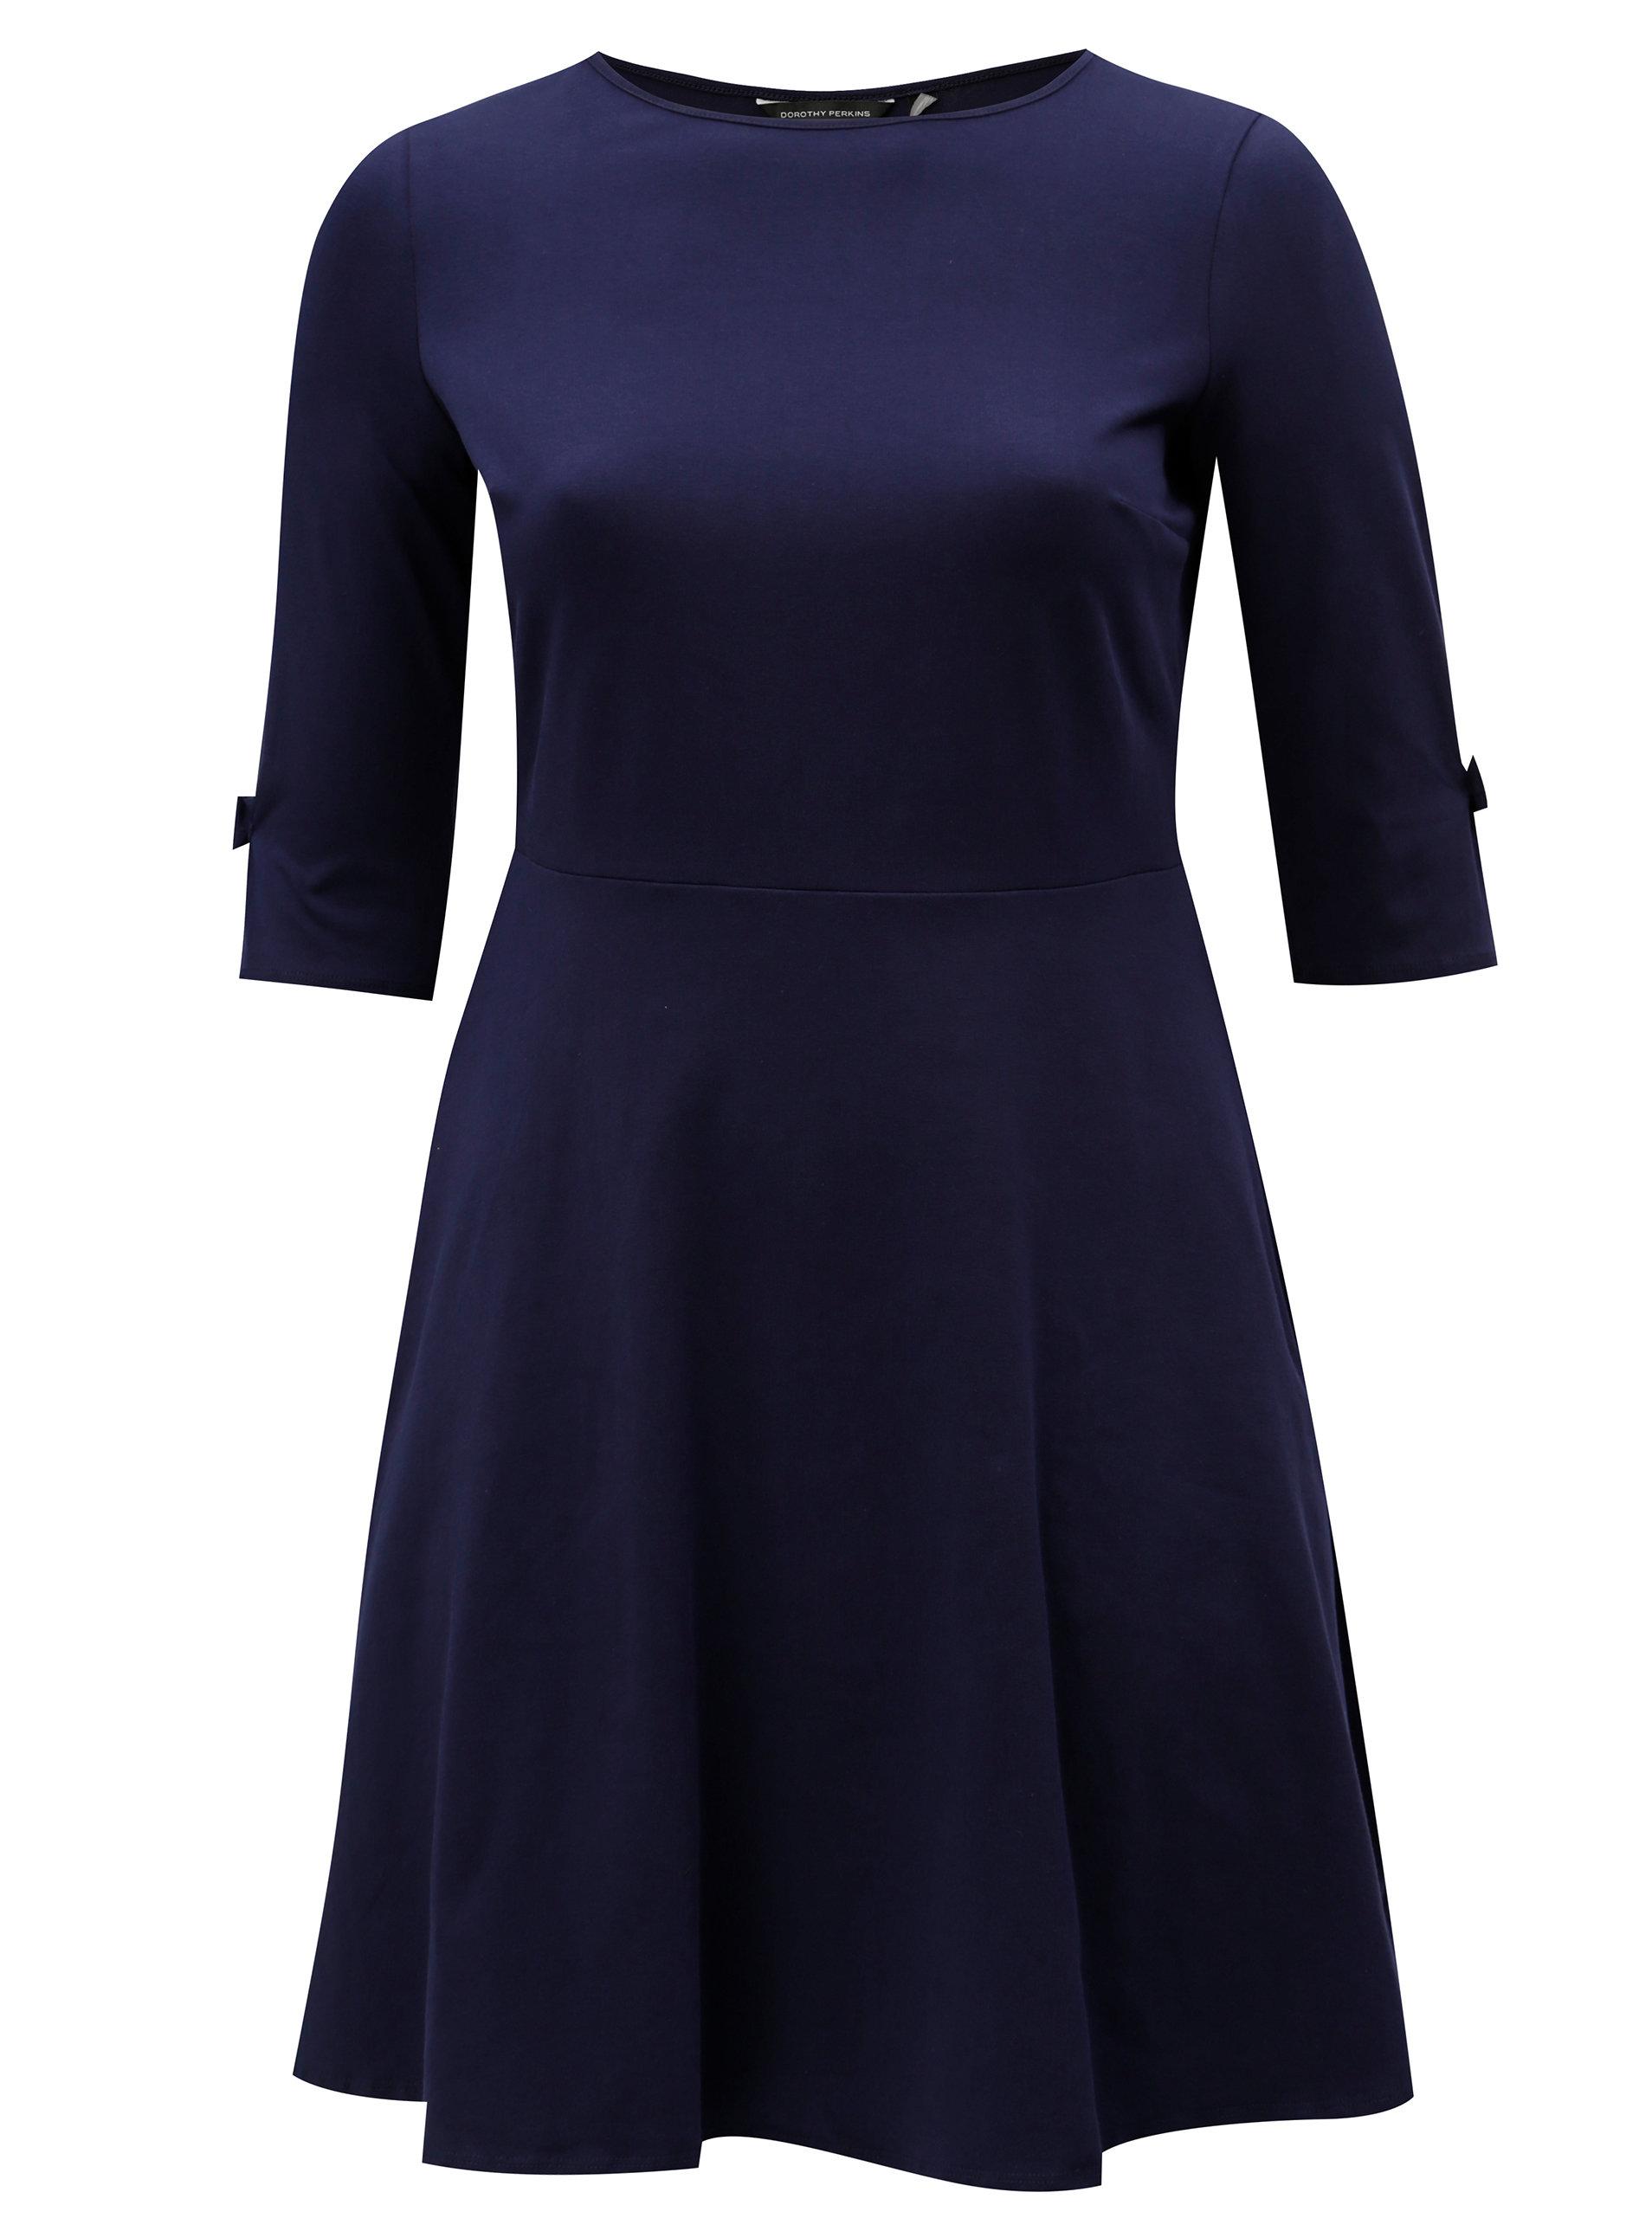 e5e82d16f6cb Tmavomodré šaty s 3 4 rukávmi Dorothy Perkins Curve ...